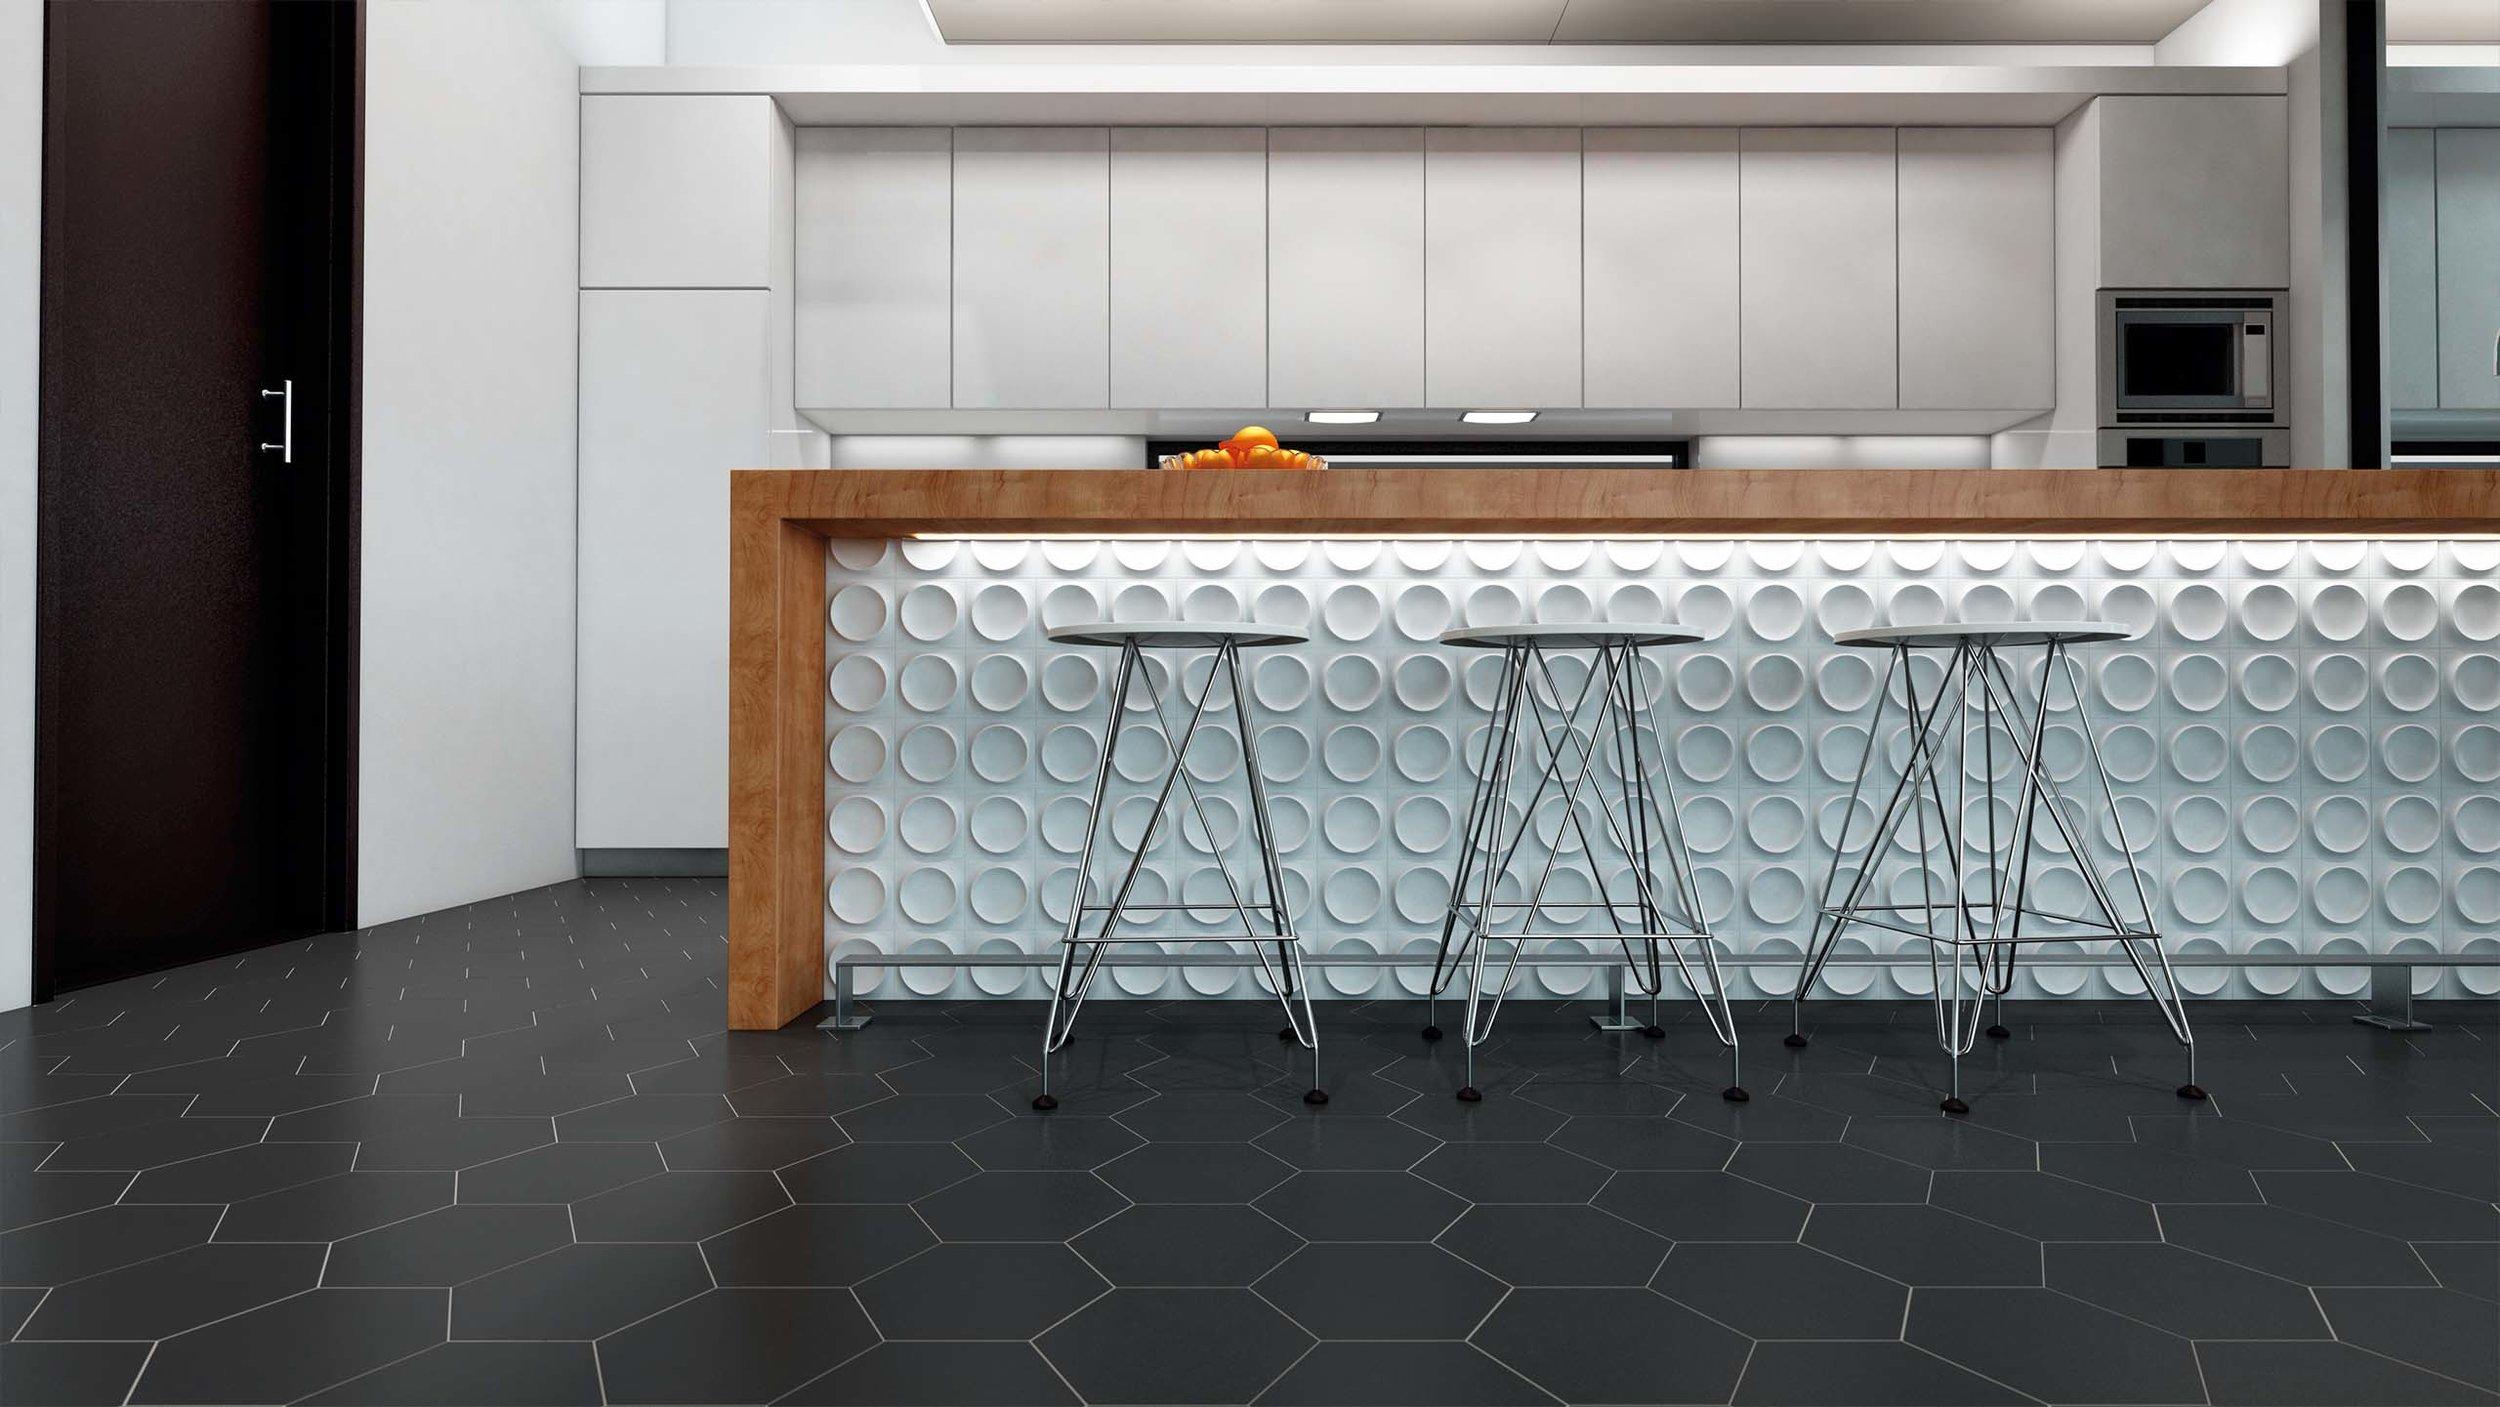 P-T817 Wow Floor porcelain floor tile palette. — Town & Country Surfaces